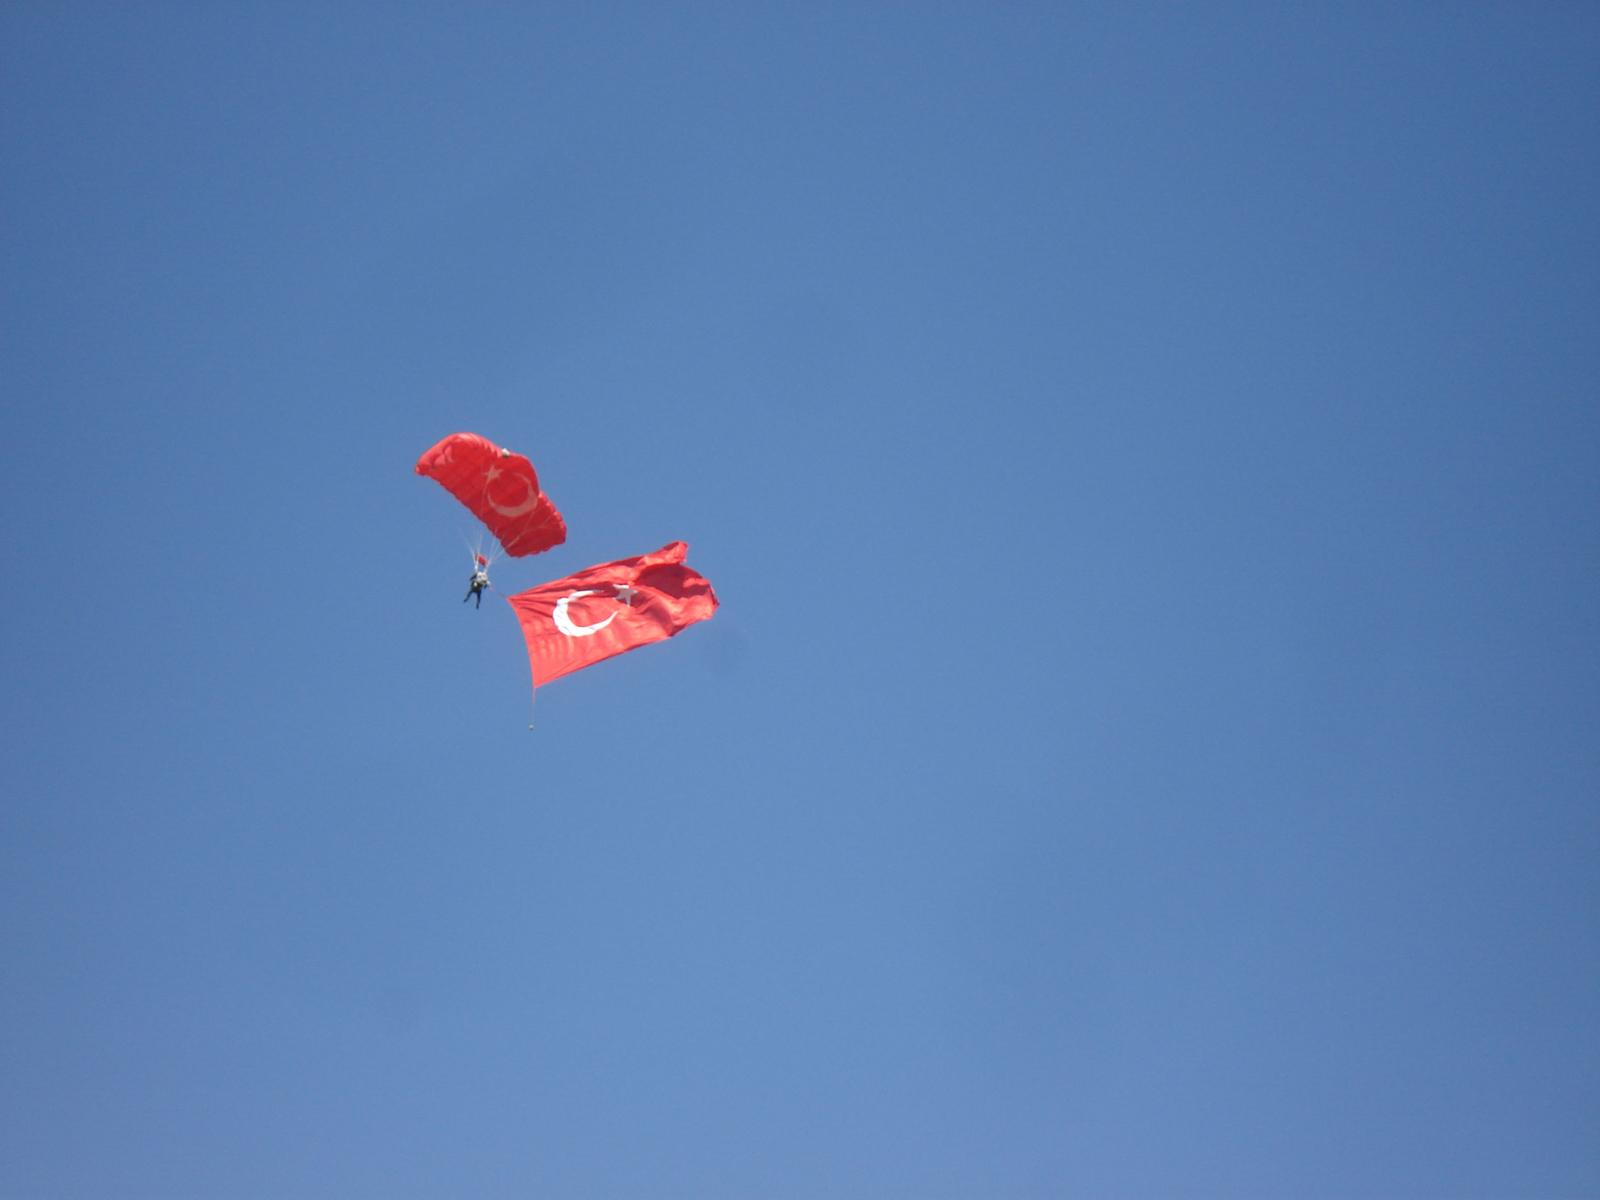 http://3.bp.blogspot.com/-kyDA8qZiPDI/TeaeHlHVK-I/AAAAAAAACc4/SLe-Ose-BTo/s1600/Parachut_.jpg